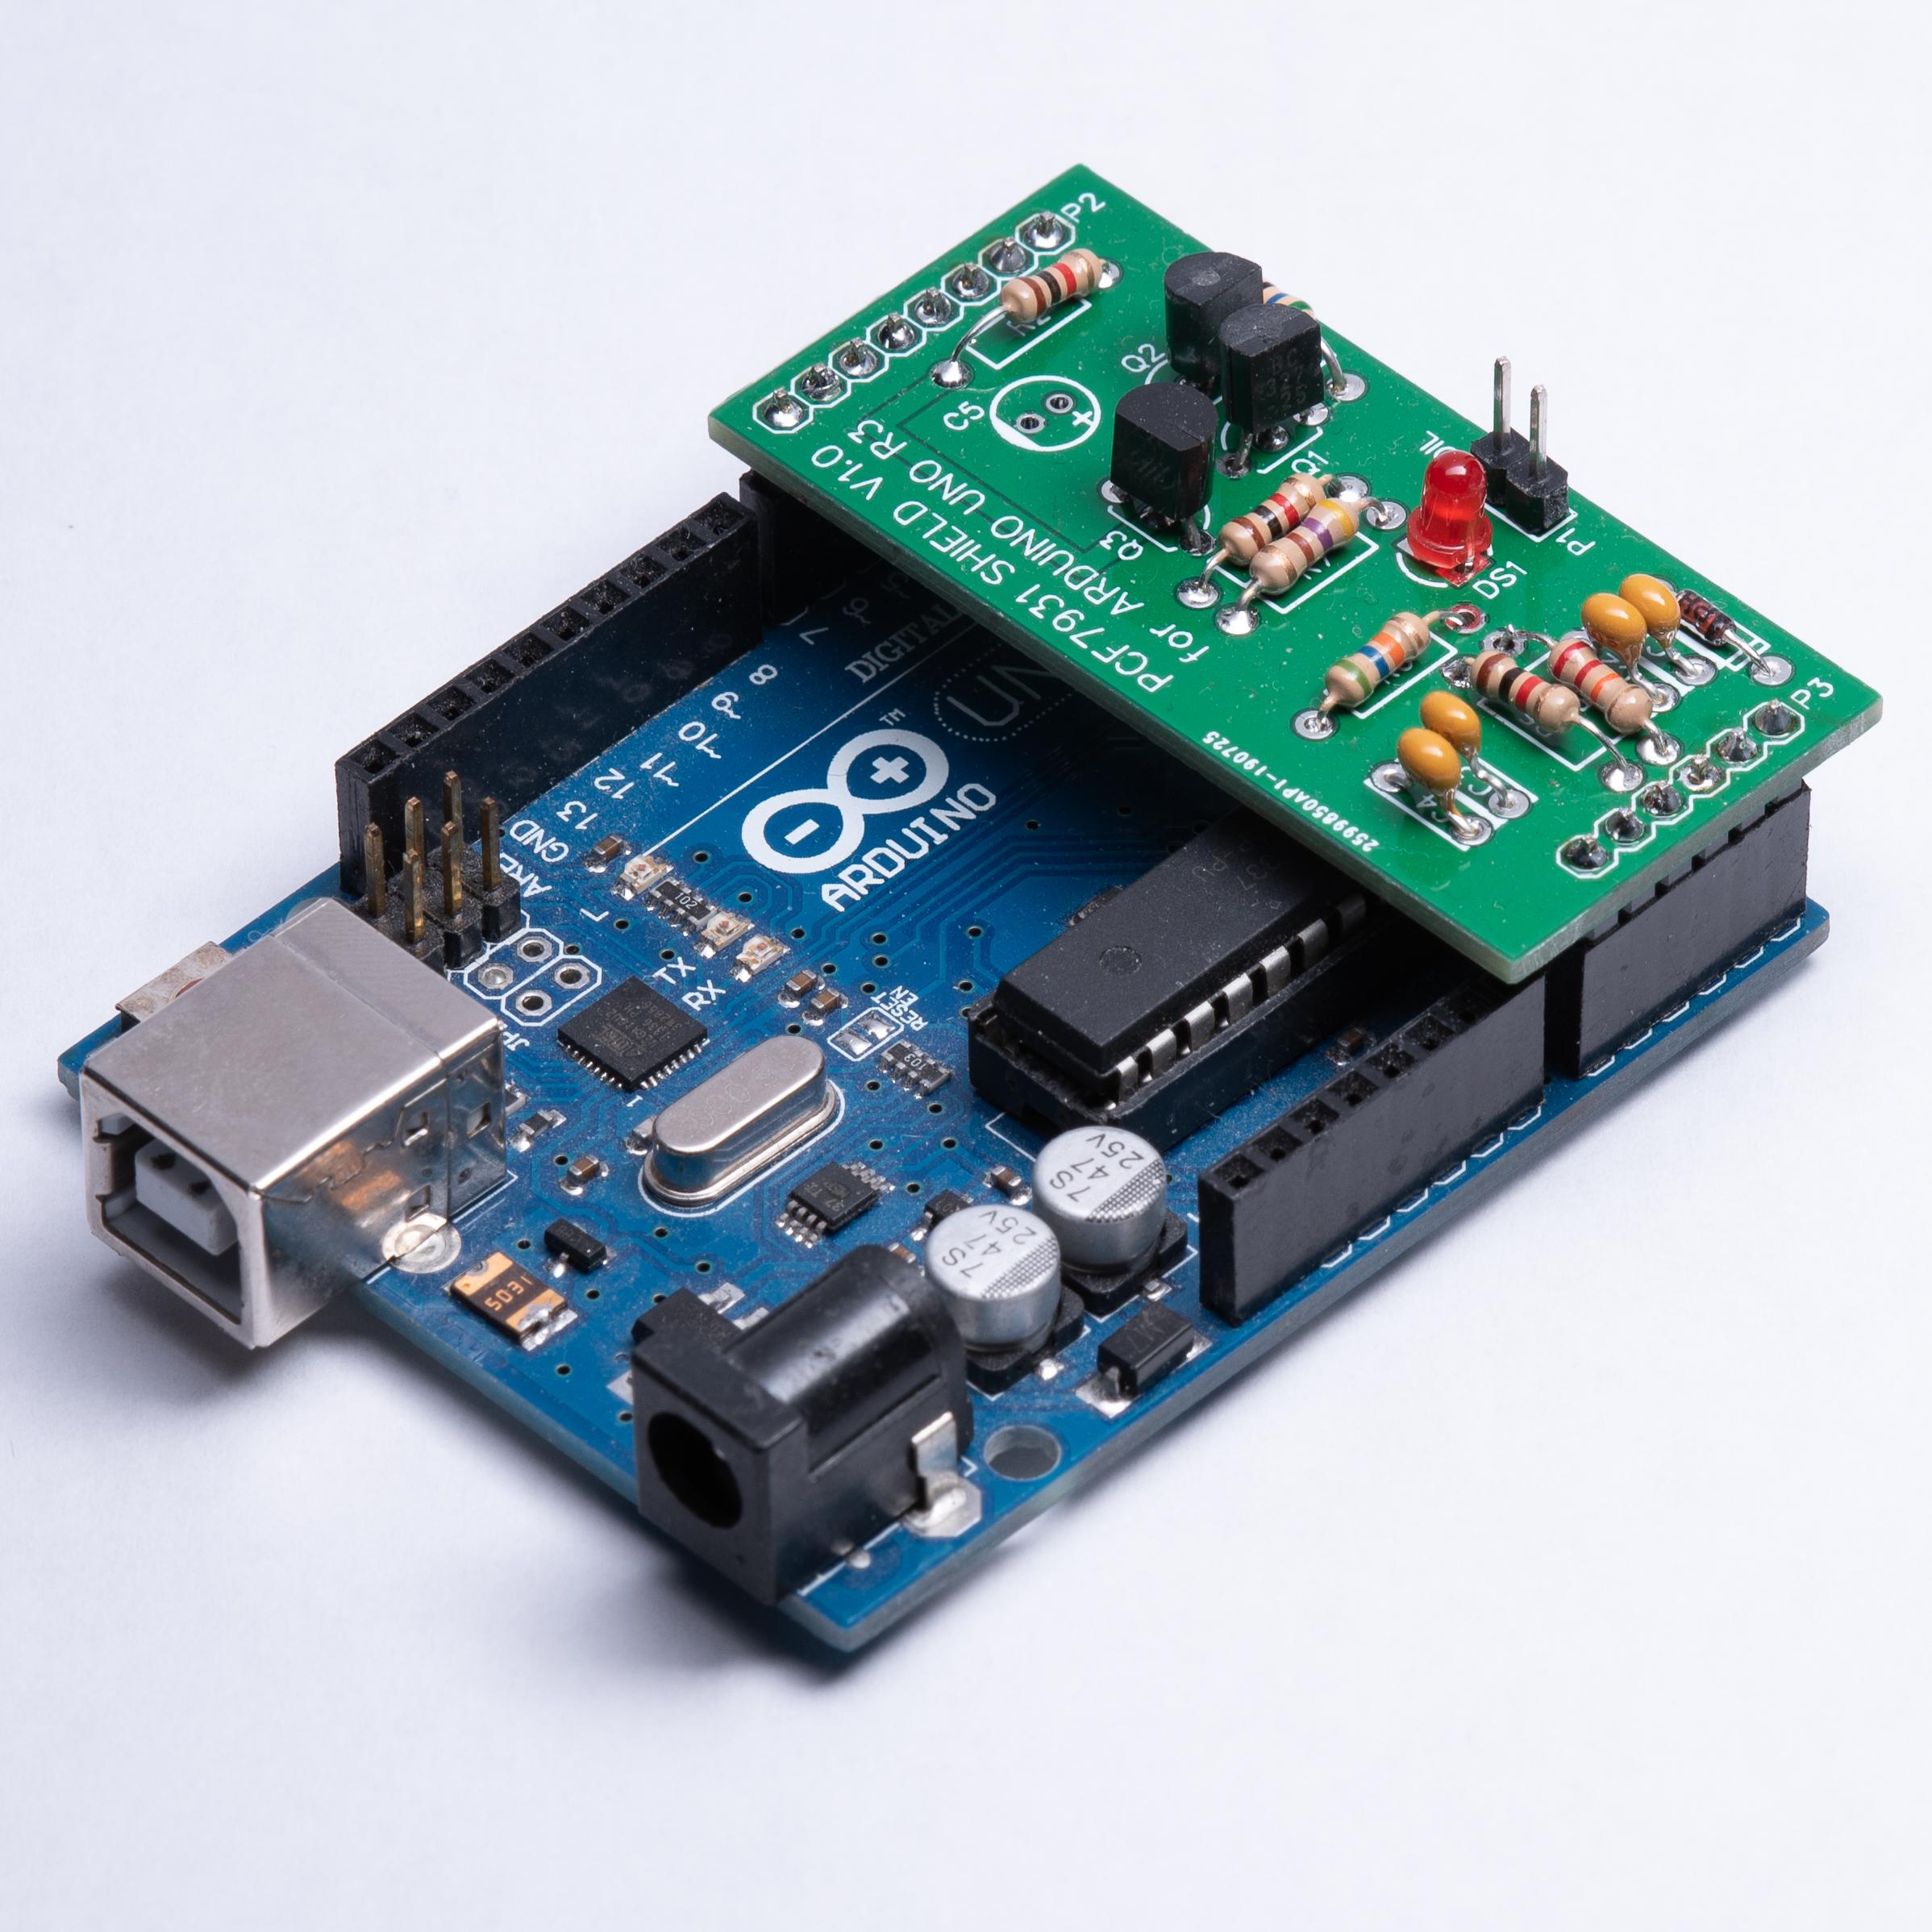 ARDUINO UNO R3 COMPATIBLE PCF7931 RFID TRANSPONDER PROGRAMMER SHIELD KIT